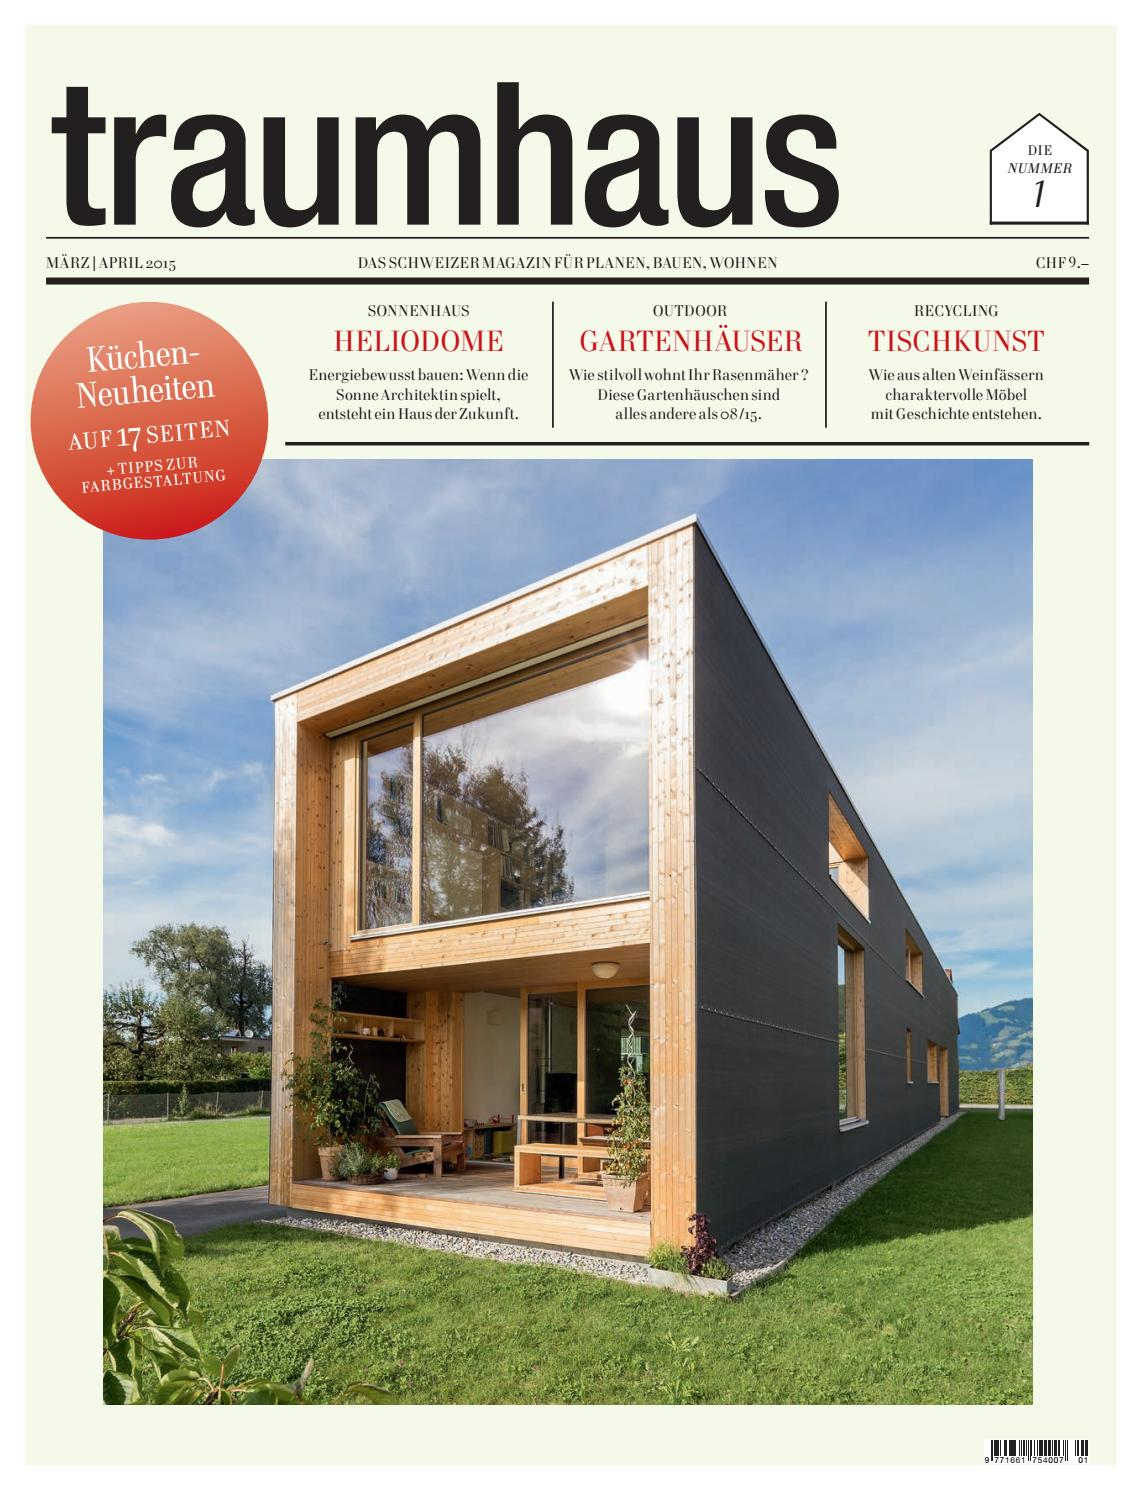 traumhaus 01 2015 by BL Verlag AG - issuu